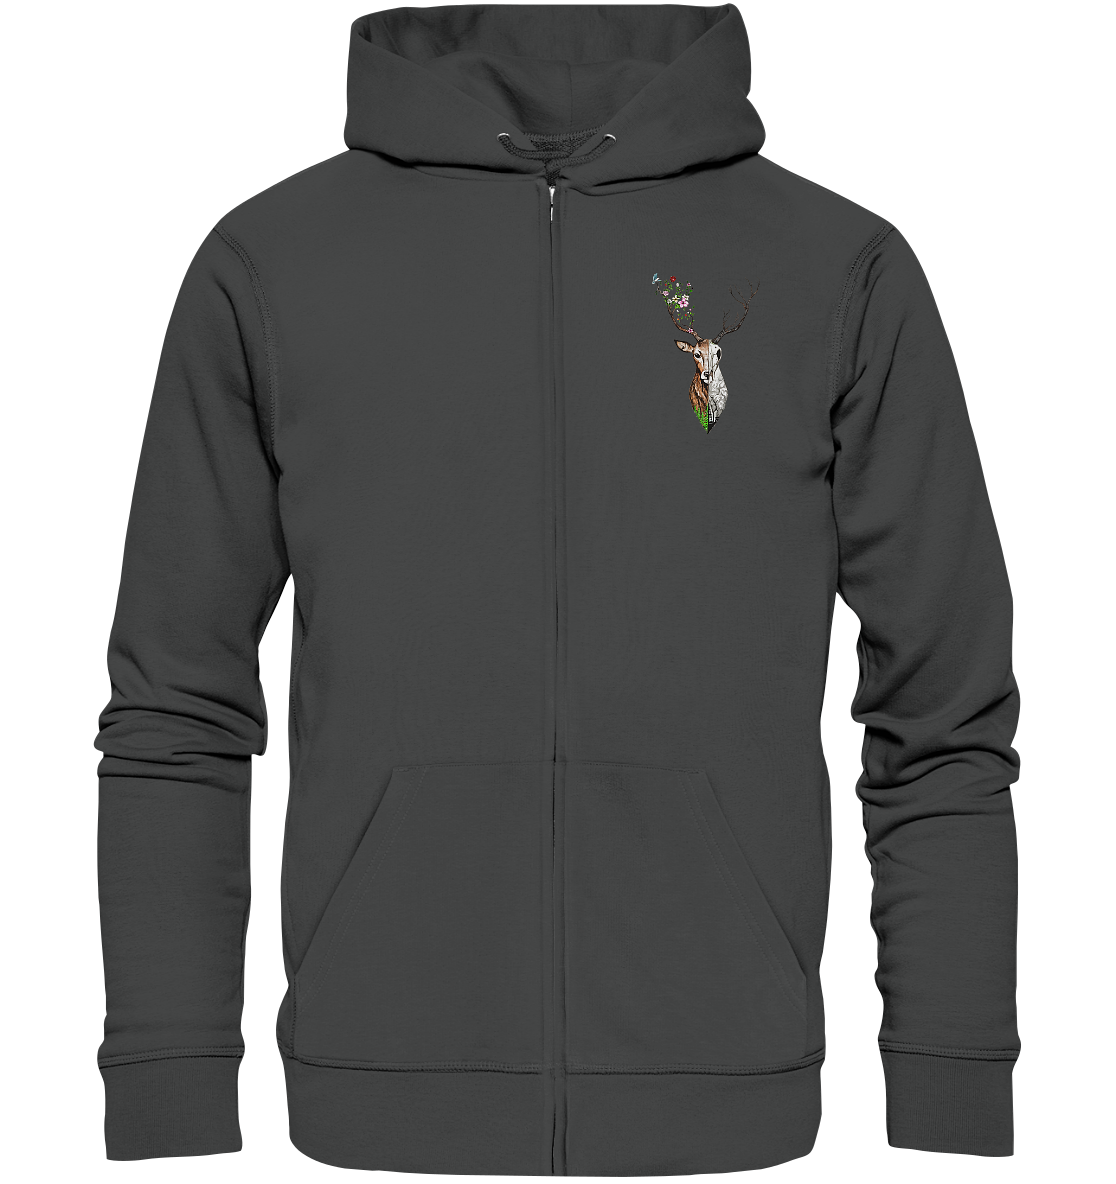 front-organic-zipper-444545-1116x-1.png